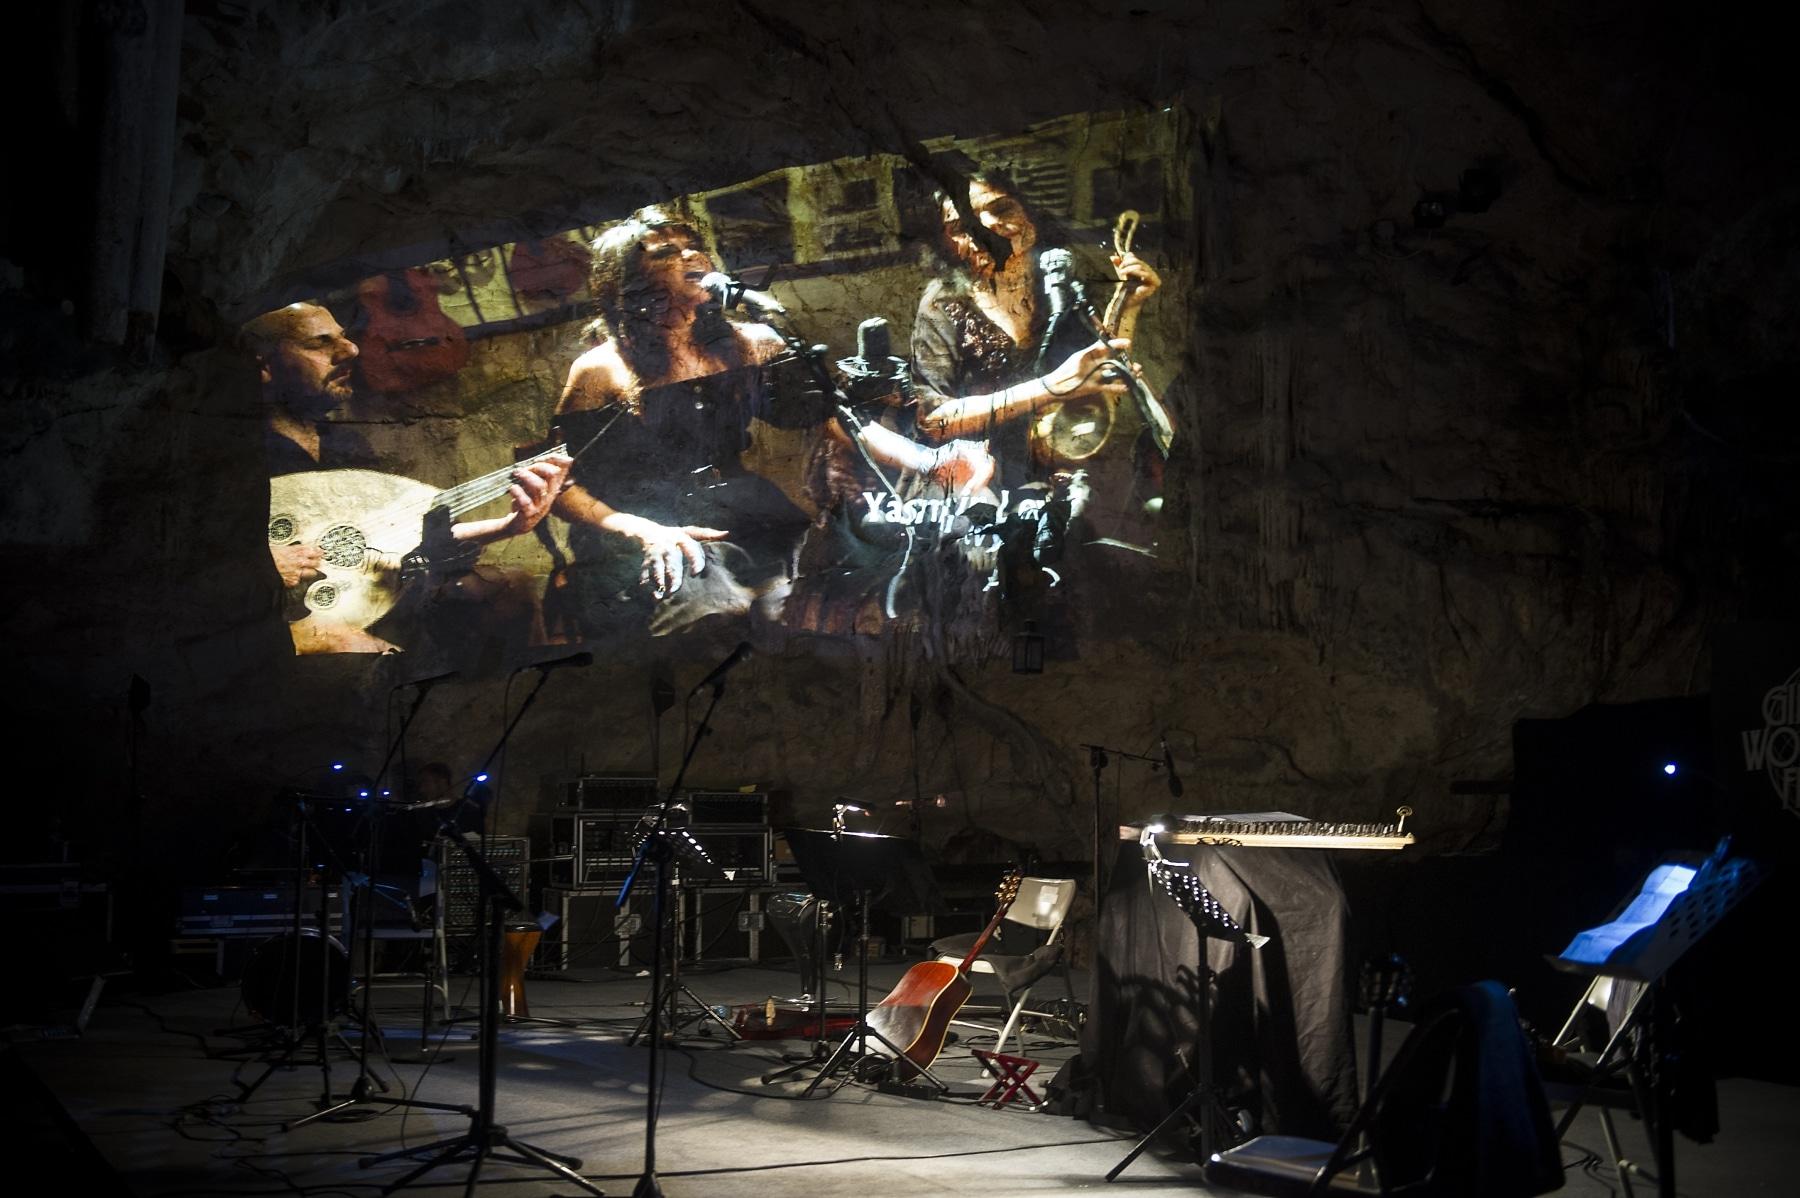 gibraltar-world-music-festival-dia-1-18_9222665493_o